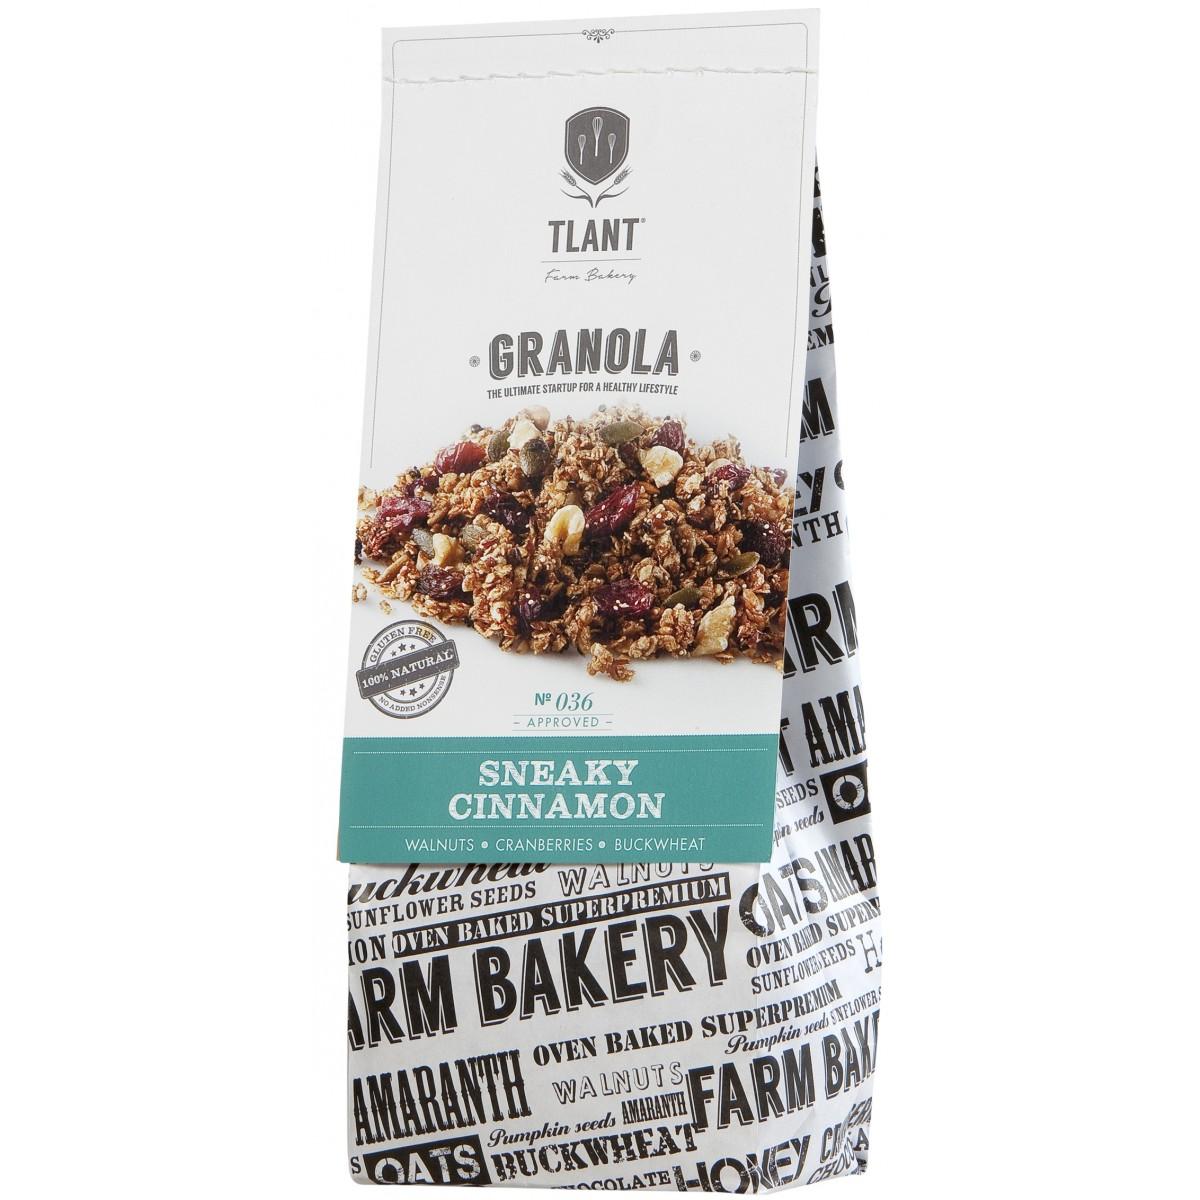 Granola Sneaky Cinnamon (T.H.T. 25-07-19)